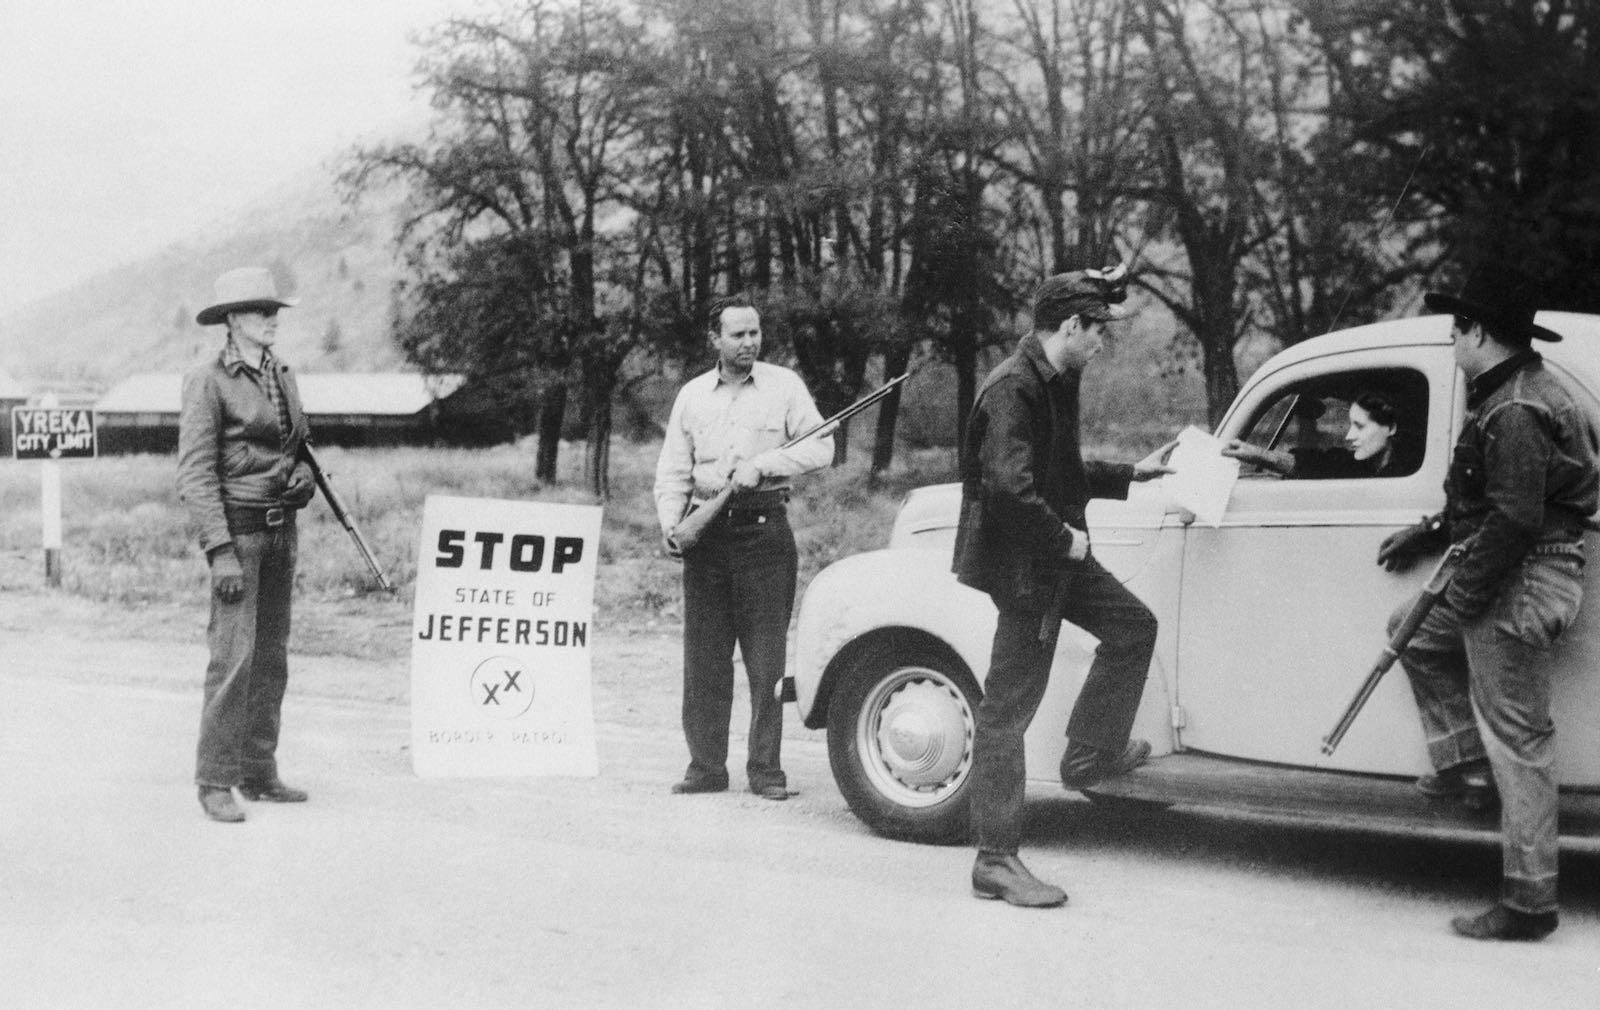 Militiamen stopping a motorist